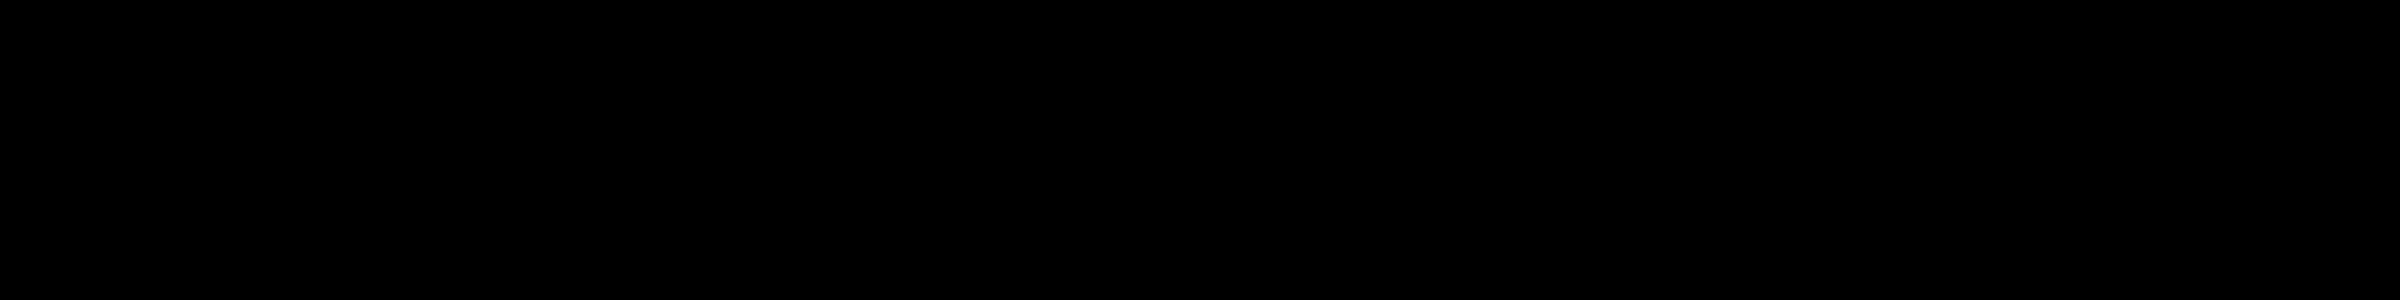 The align bundle